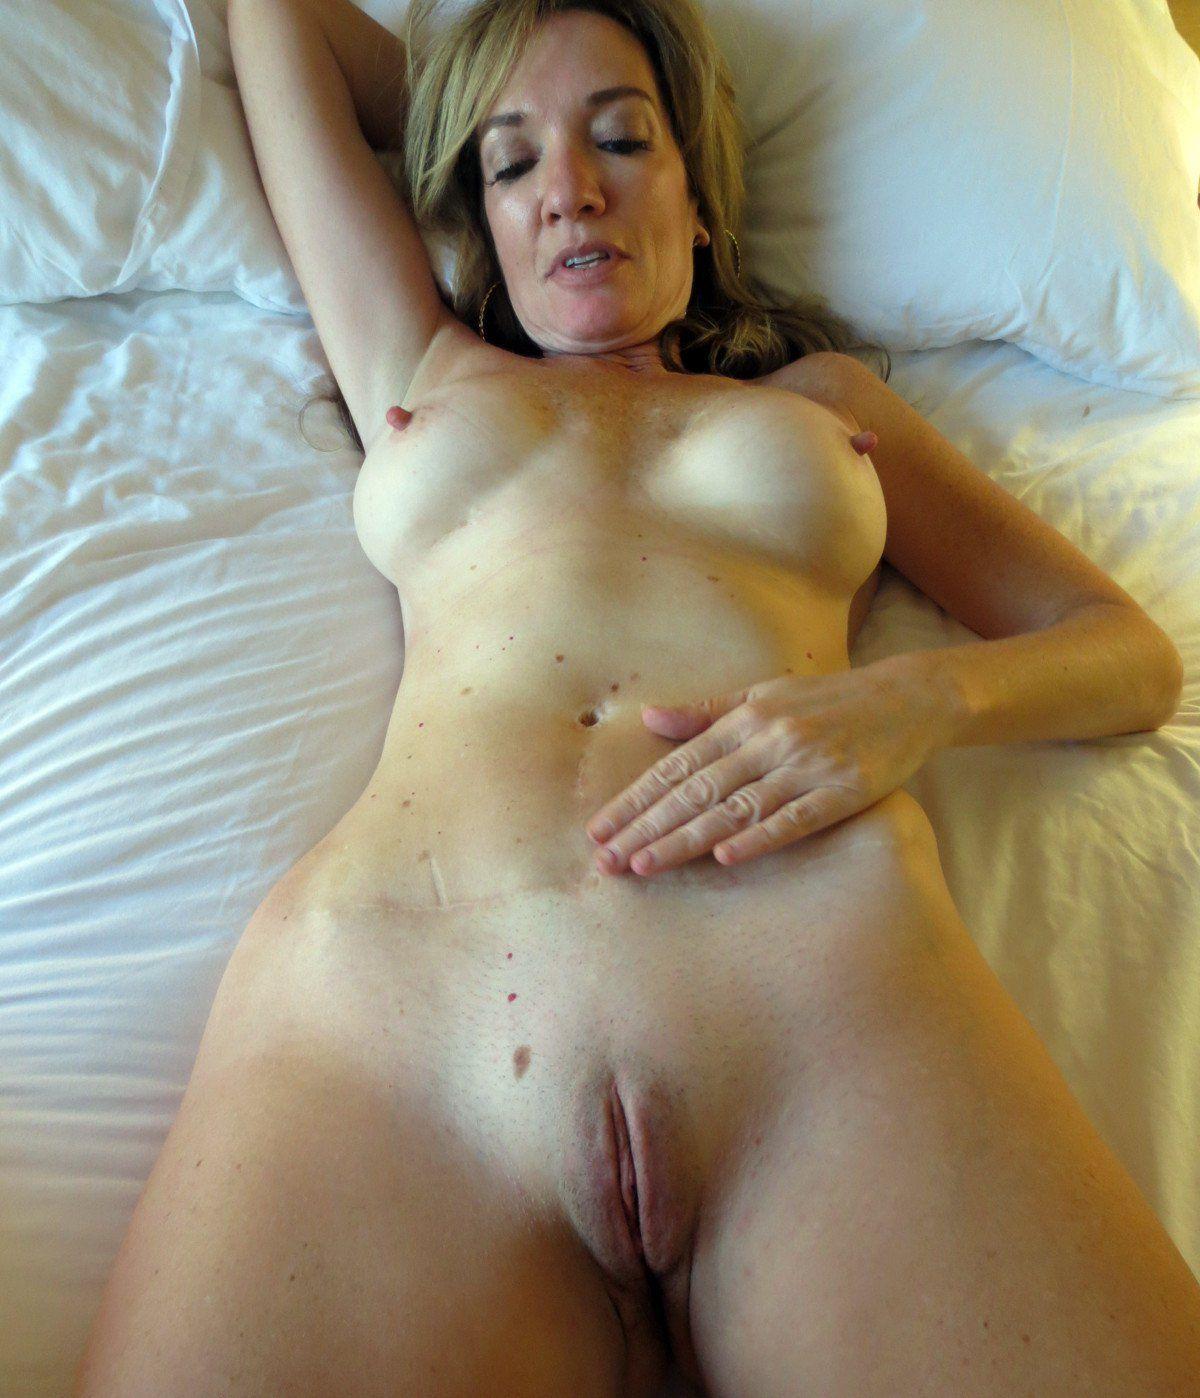 best of Wife Hot selfies nude